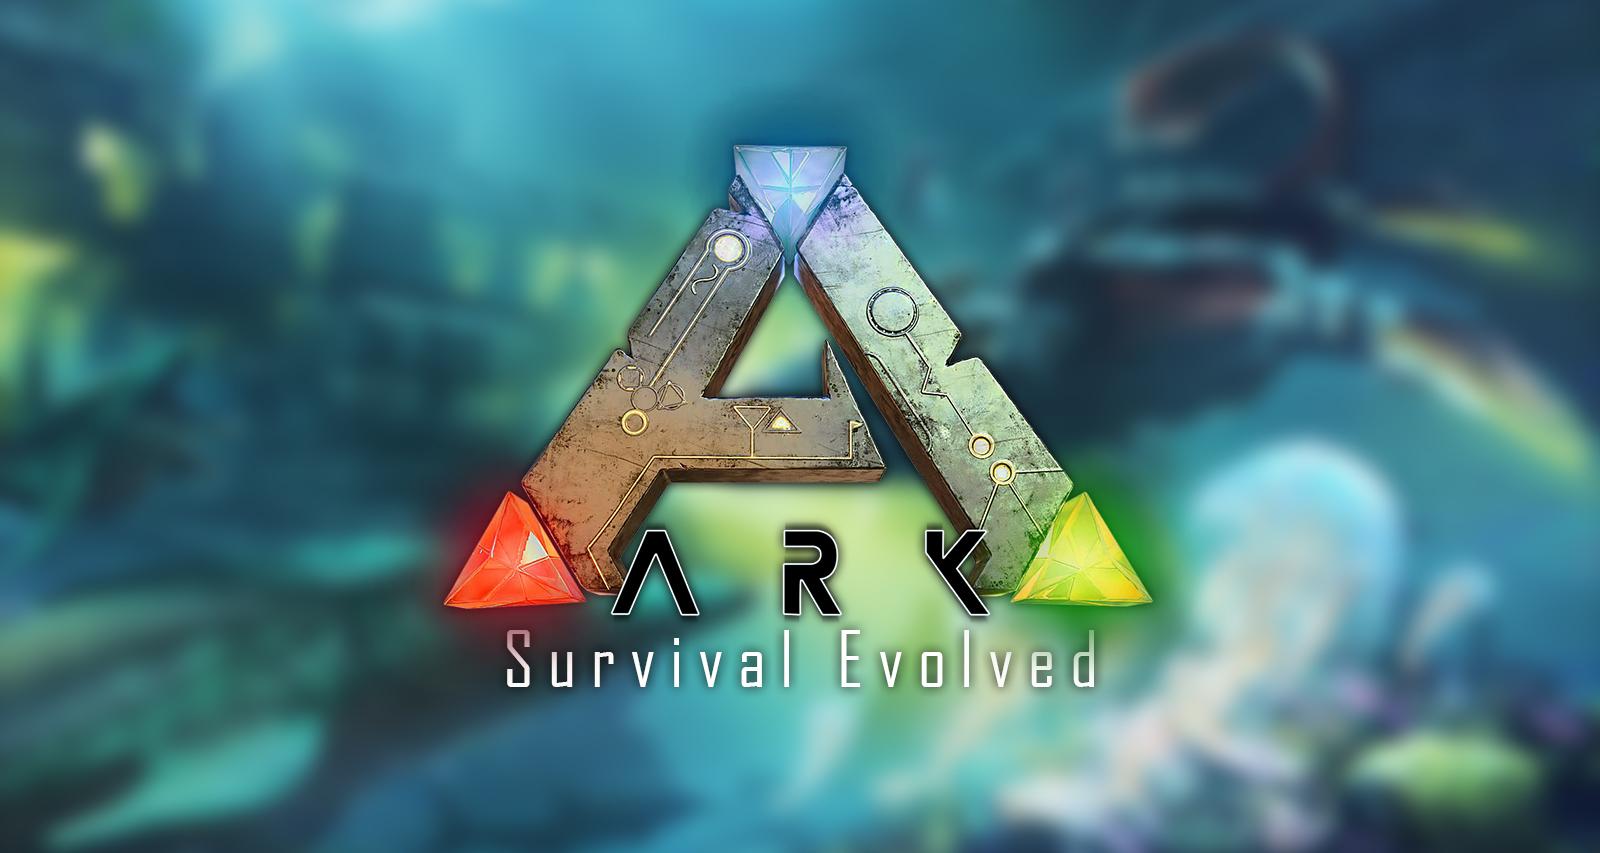 ARK SURVIVAL EVOLVED V257.23 + DLC'S EDITION PC FULL ESPAÑOL 2017